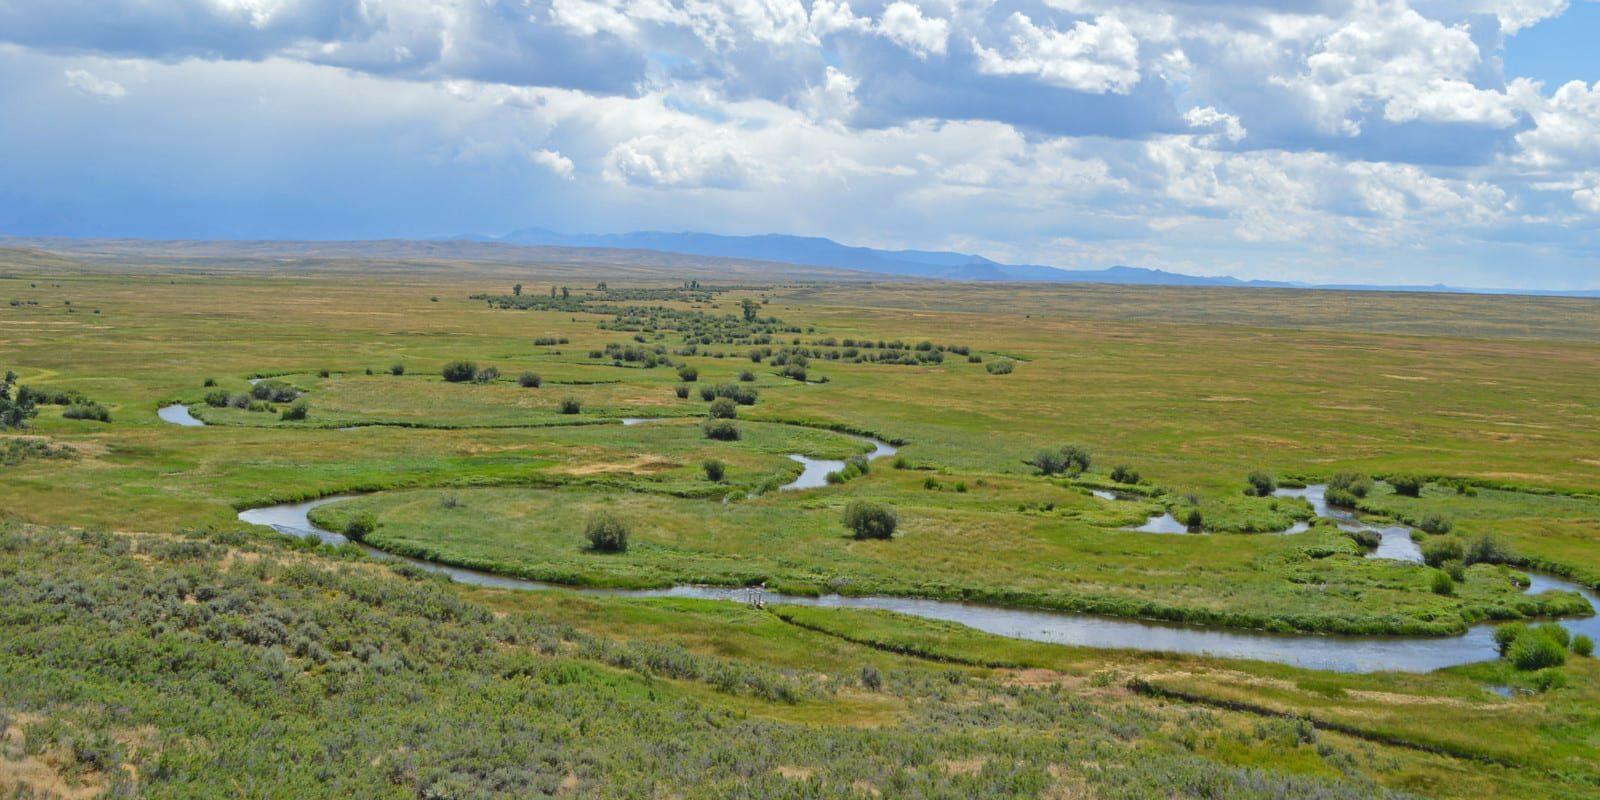 Image of the Illinois River in Colorado